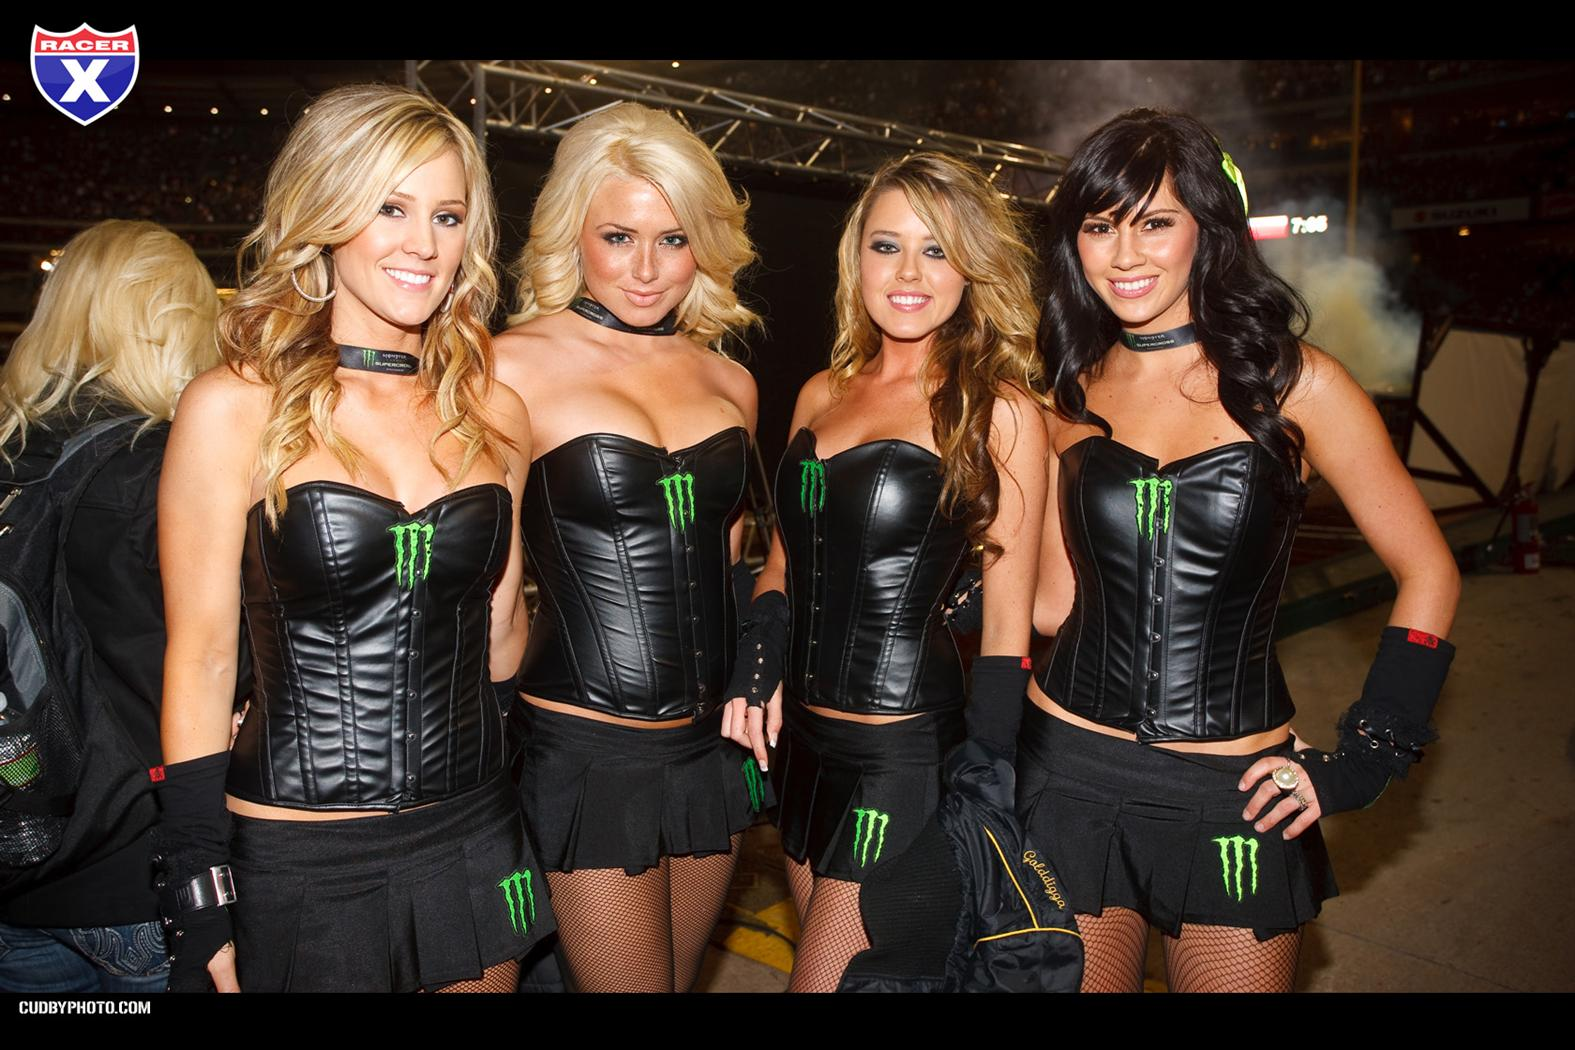 Motocross Pin Up Girls 1575x1050